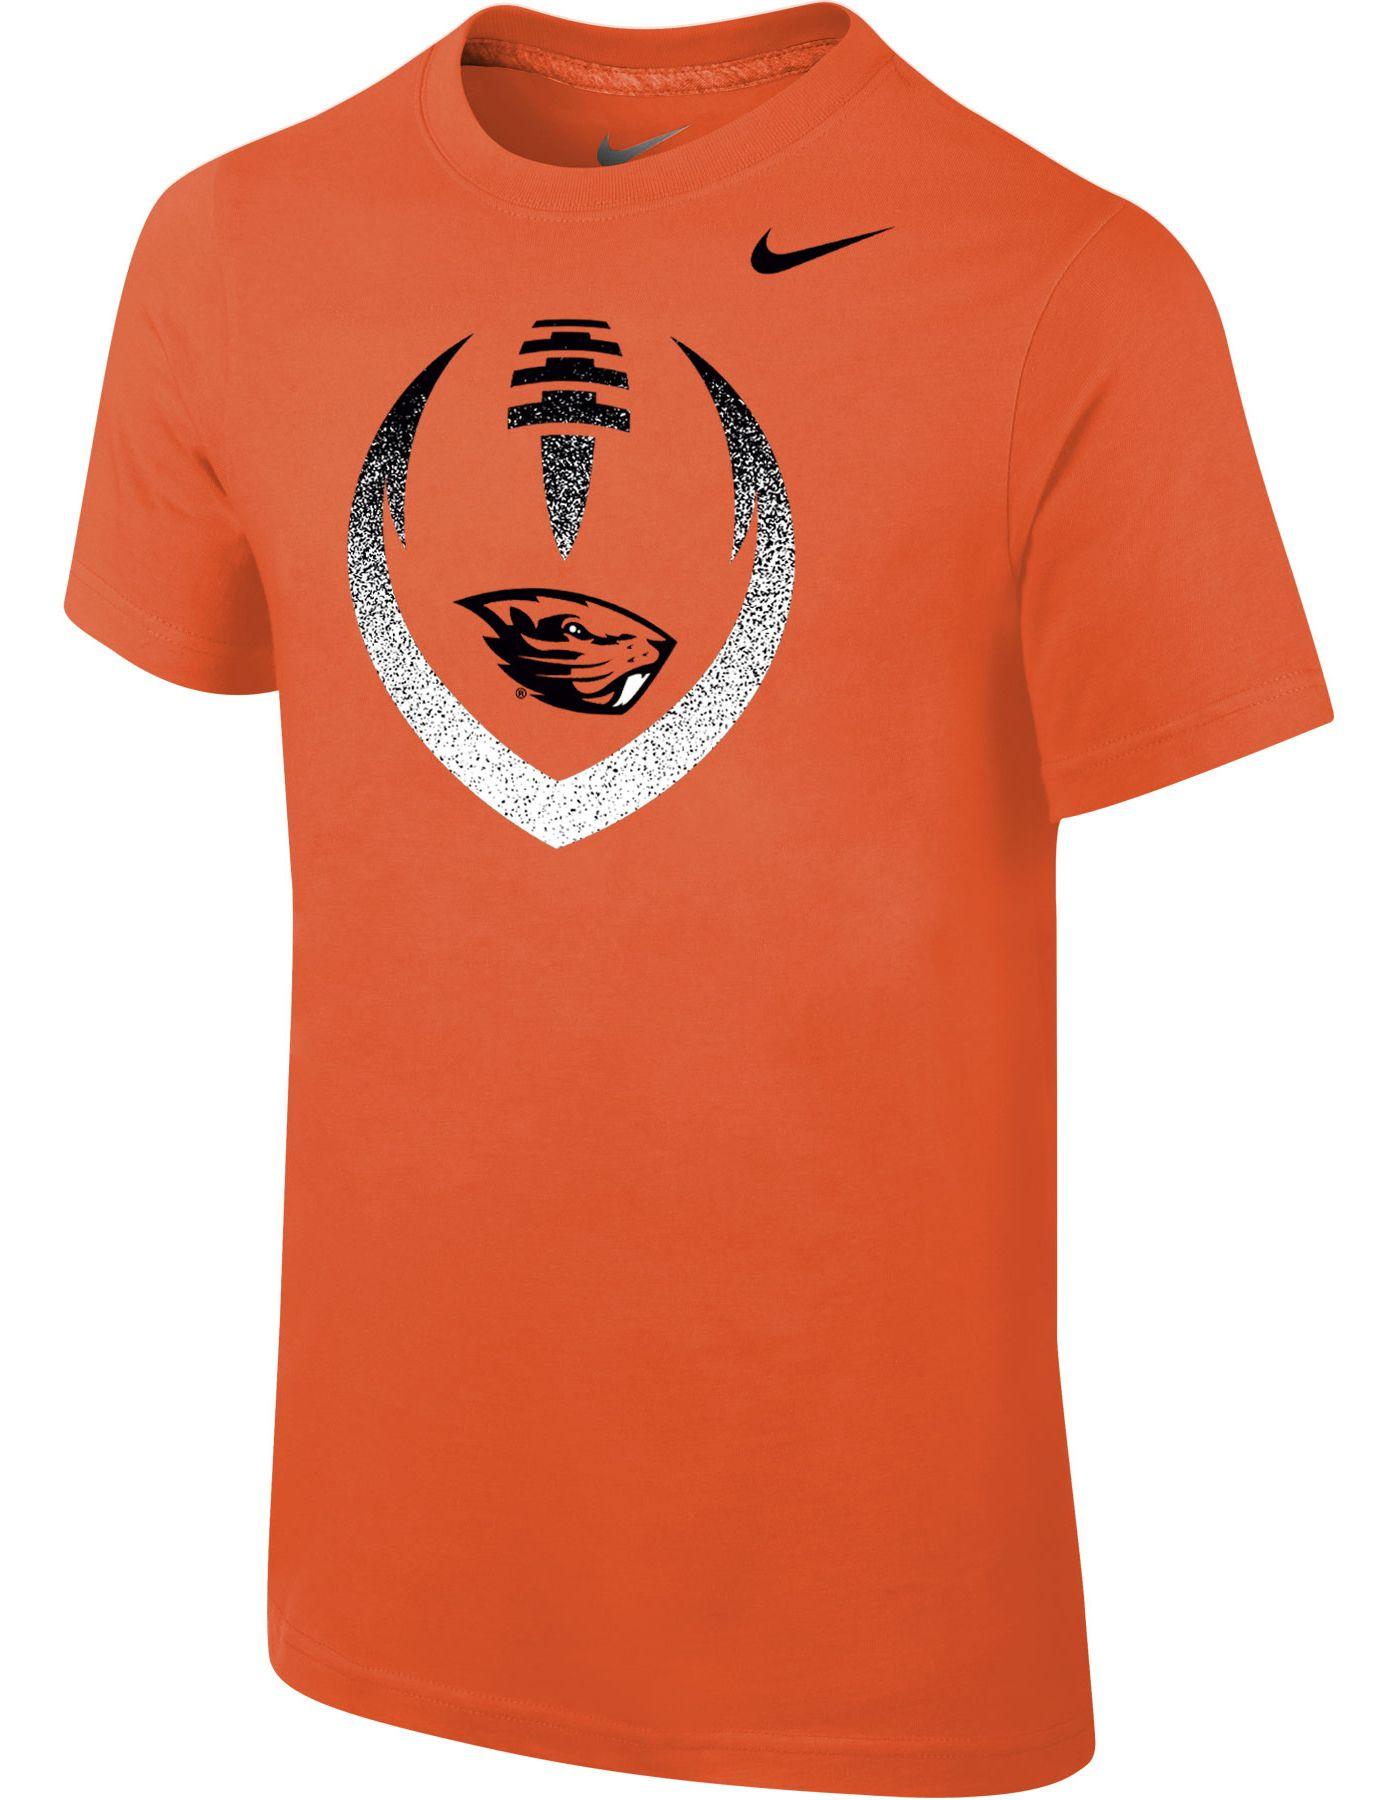 Nike Youth Oregon State Beavers Orange Cotton Football Icon T-Shirt